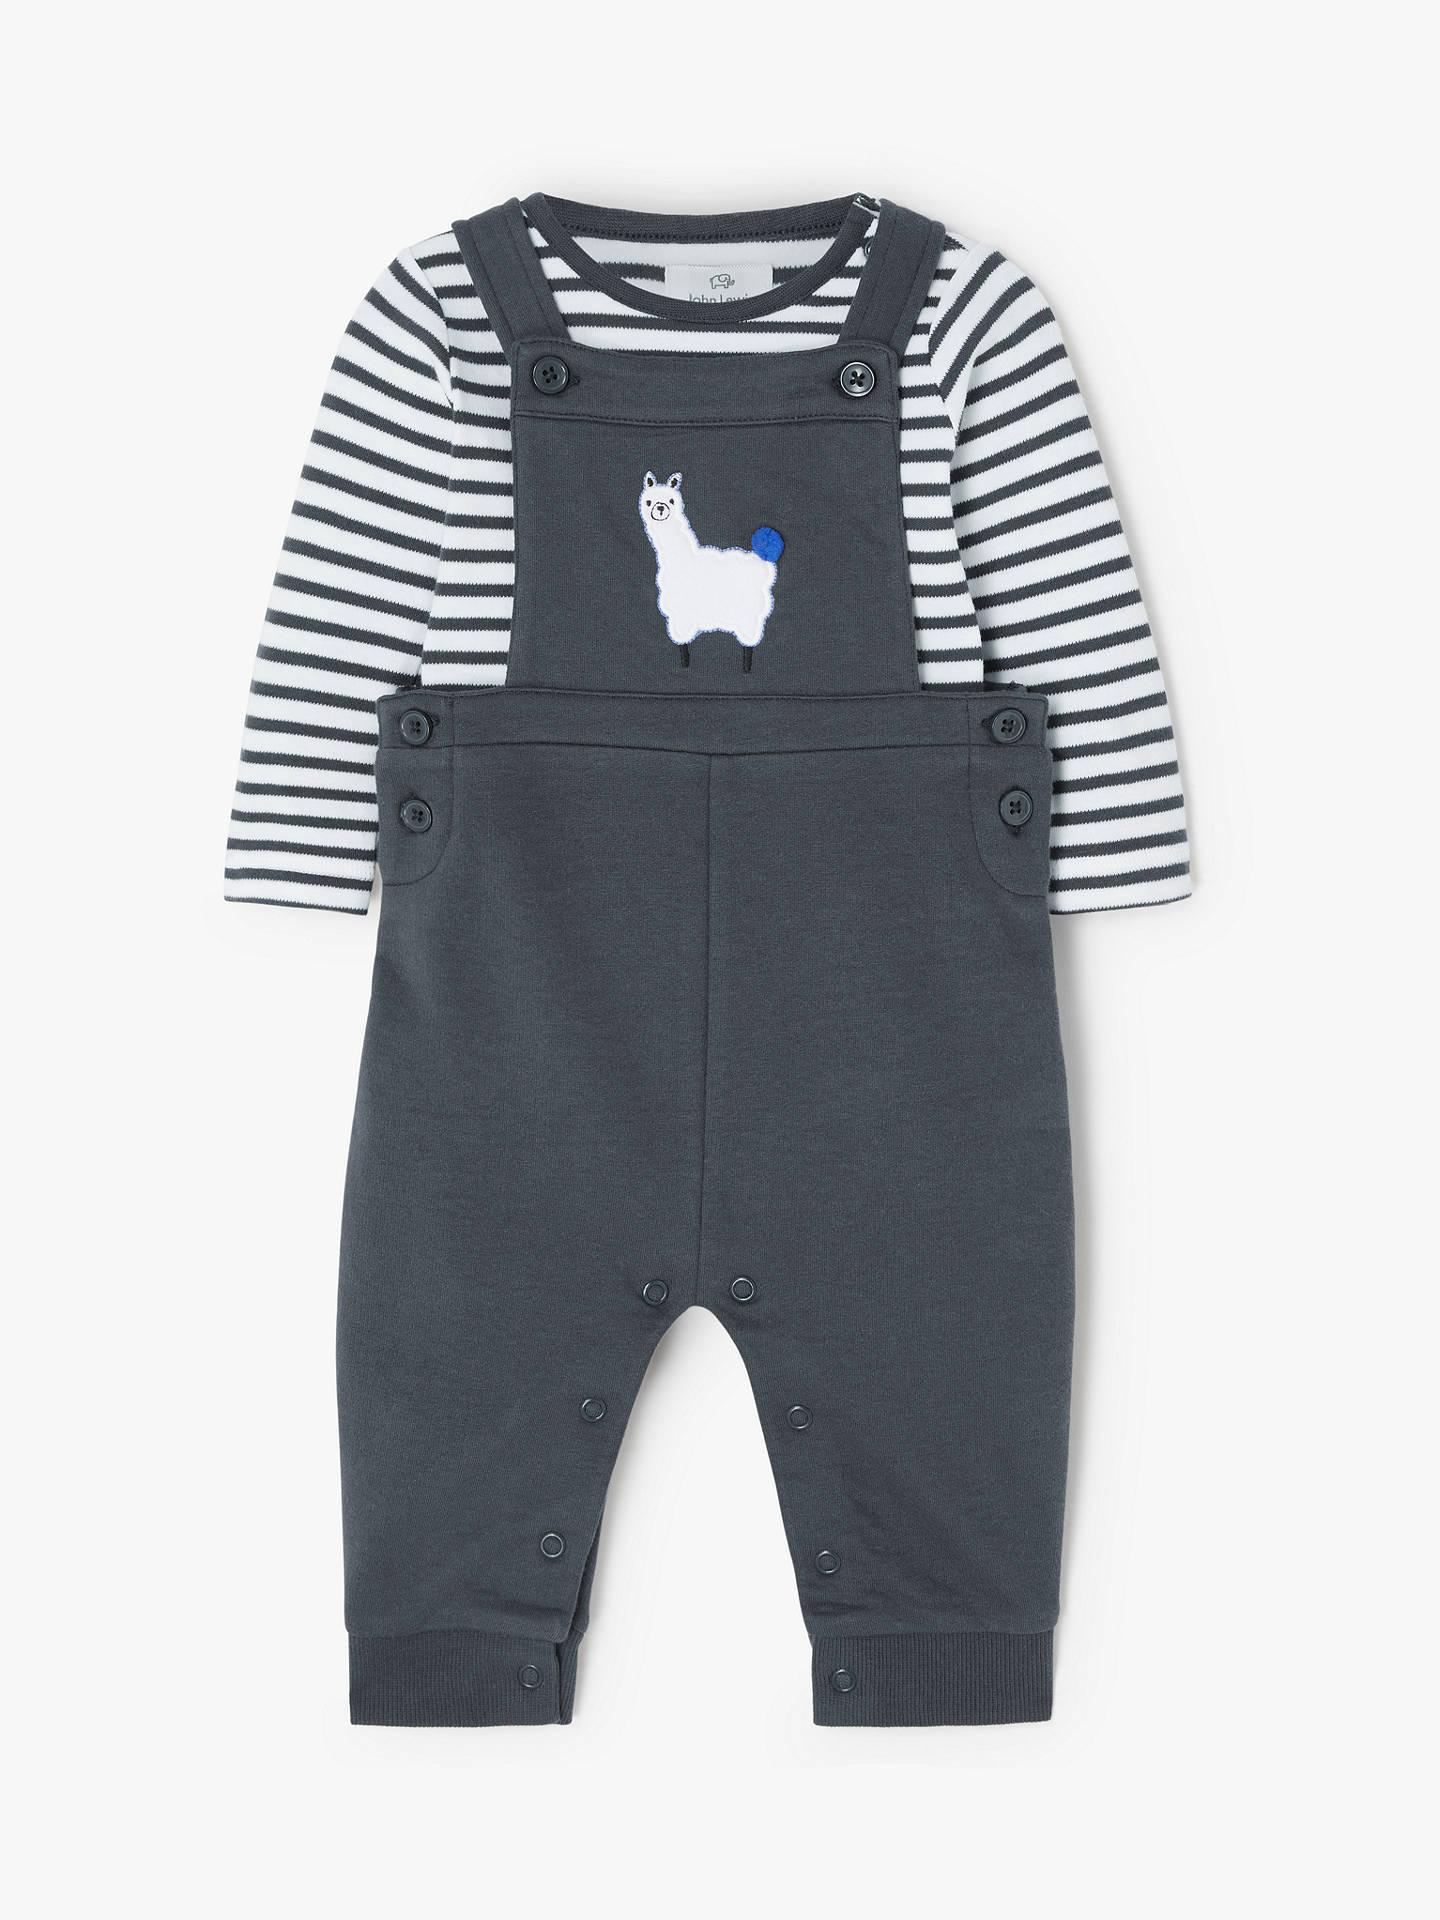 John Lewis & Partners Baby Gots Organic Cotton Llama Stripe Dungaree Set, Charcoal Grey by John Lewis & Partners